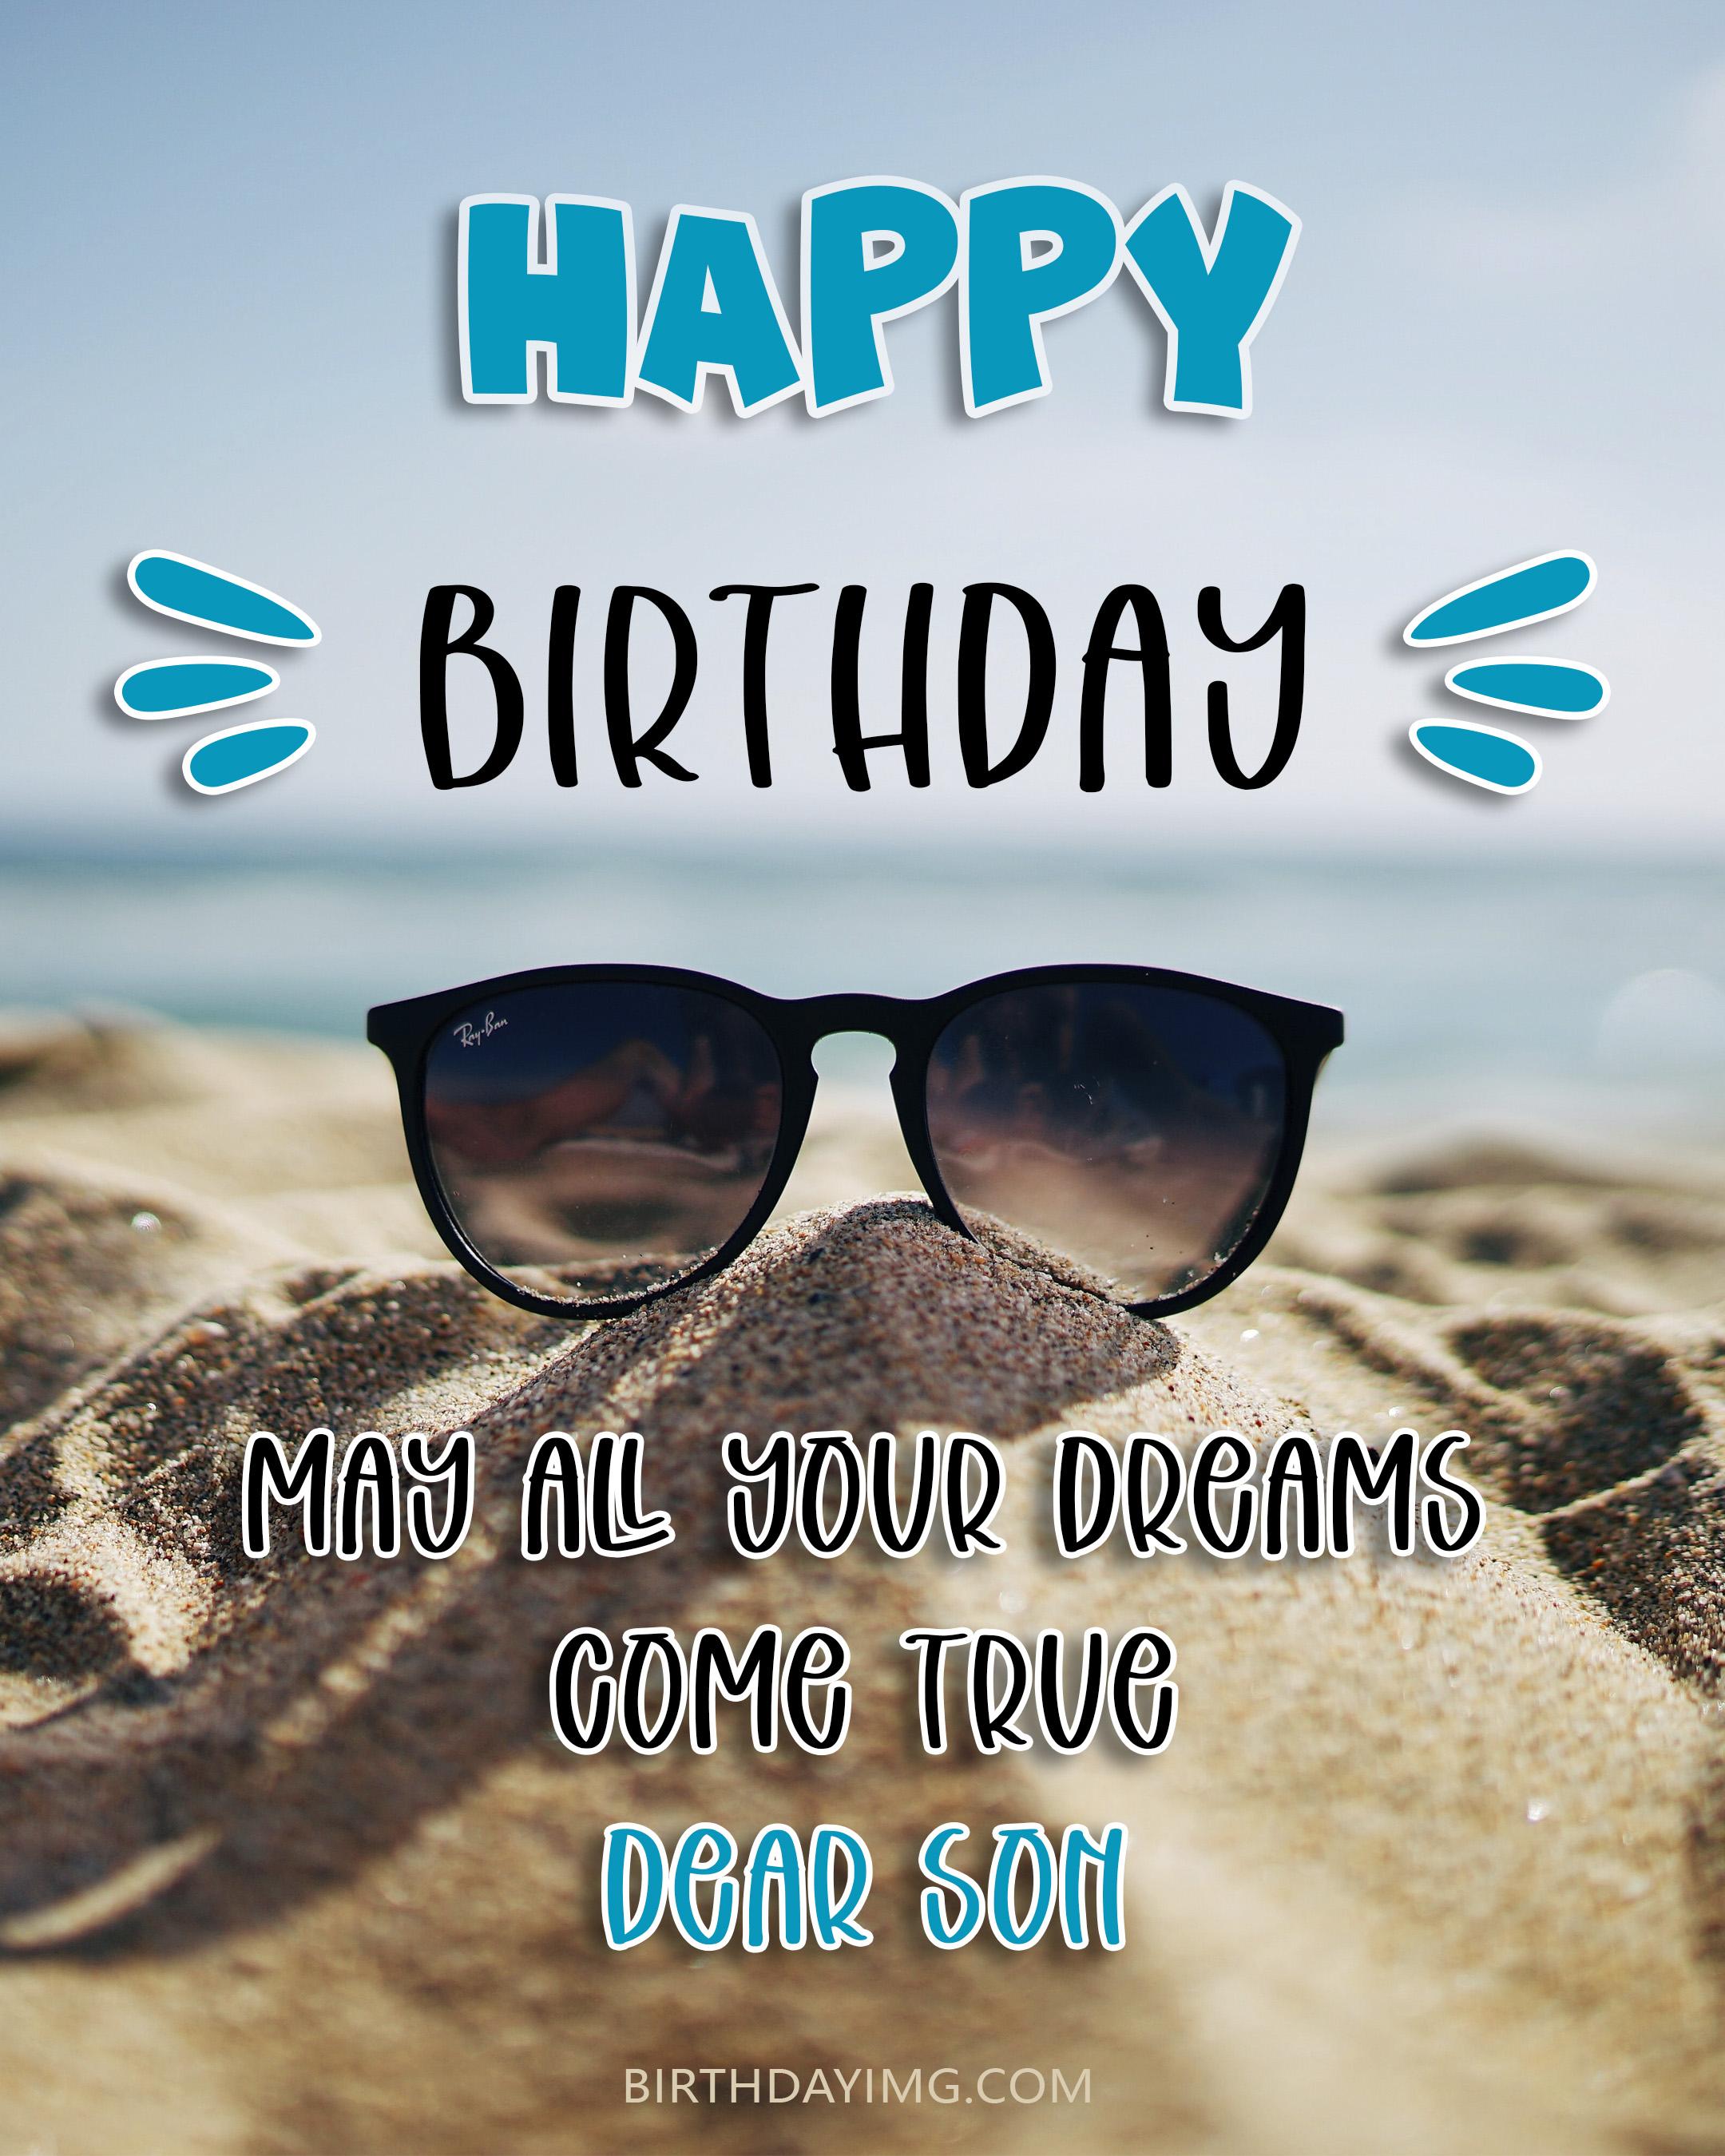 Free Happy Birthday Image For Son with Sand on Beach - birthdayimg.com